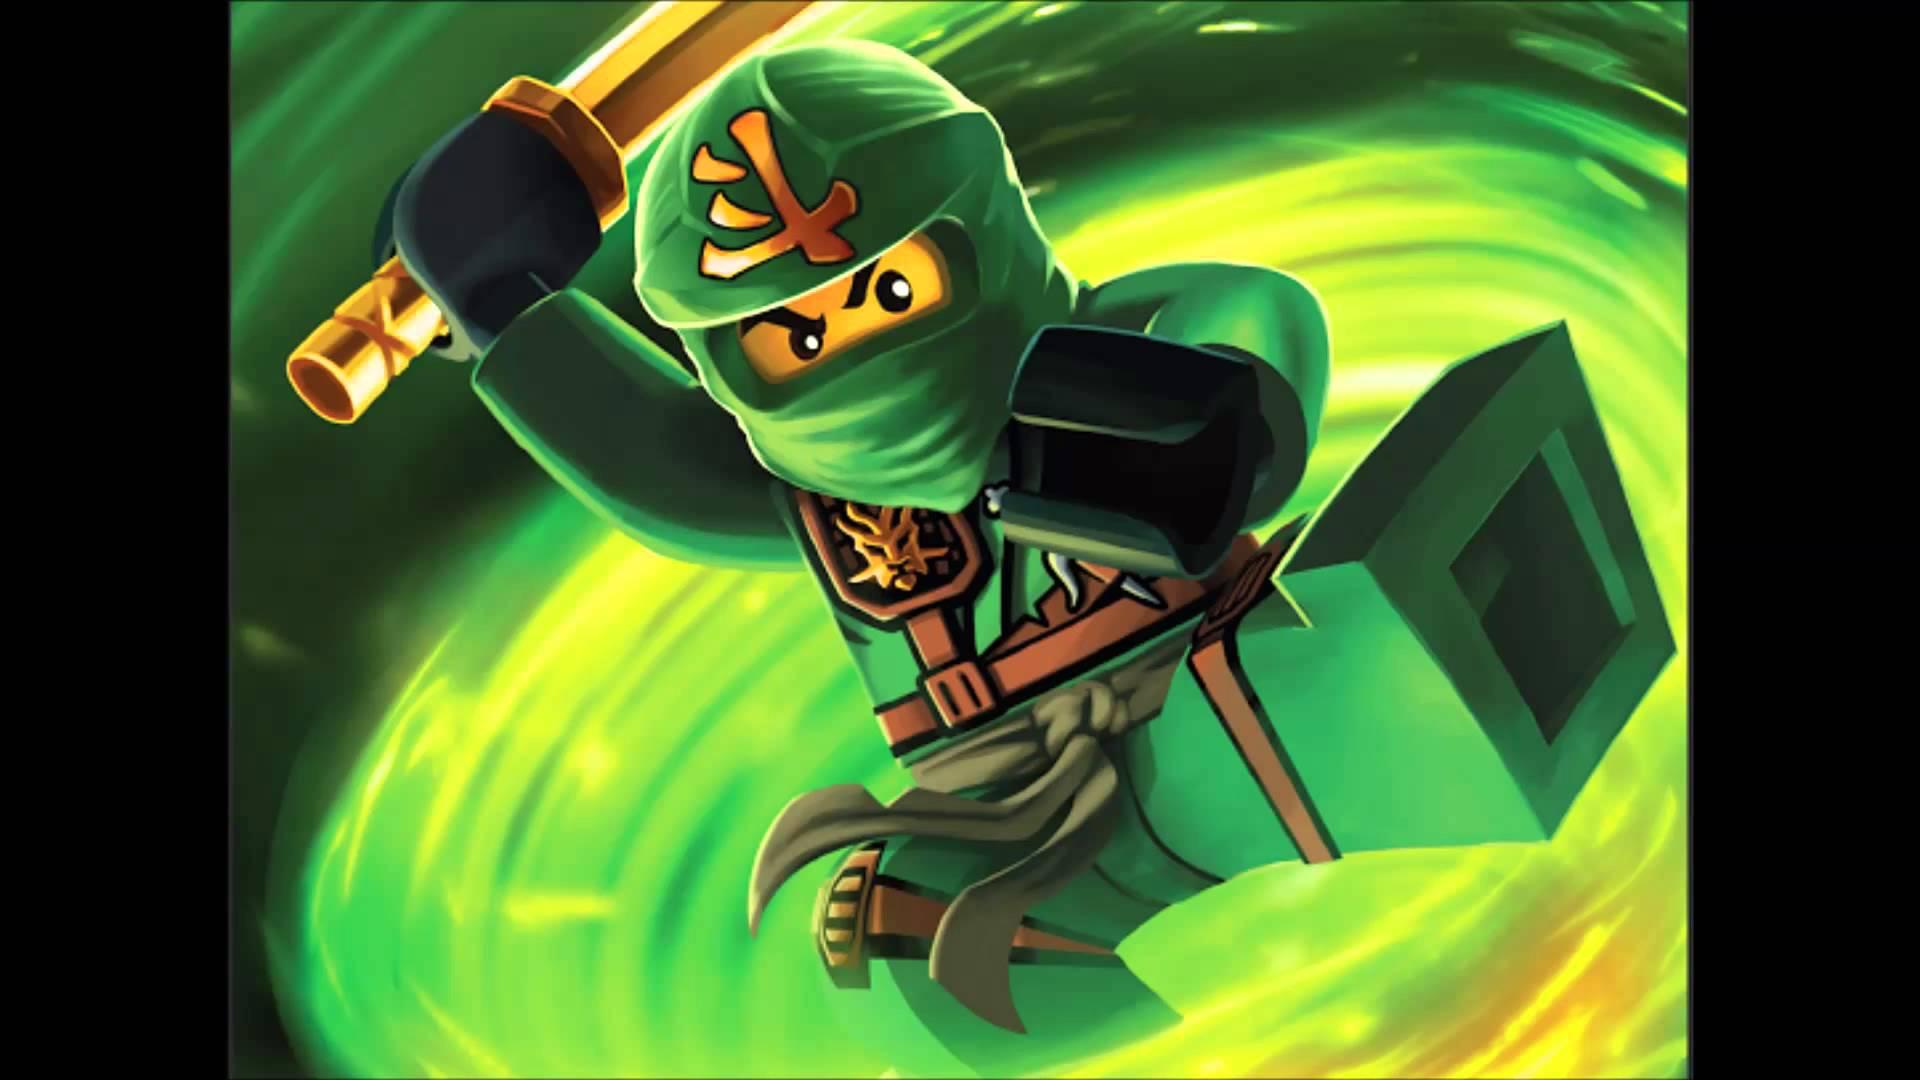 Ninjago wallpapers wallpaper cave - Lego ninjago 4 ...